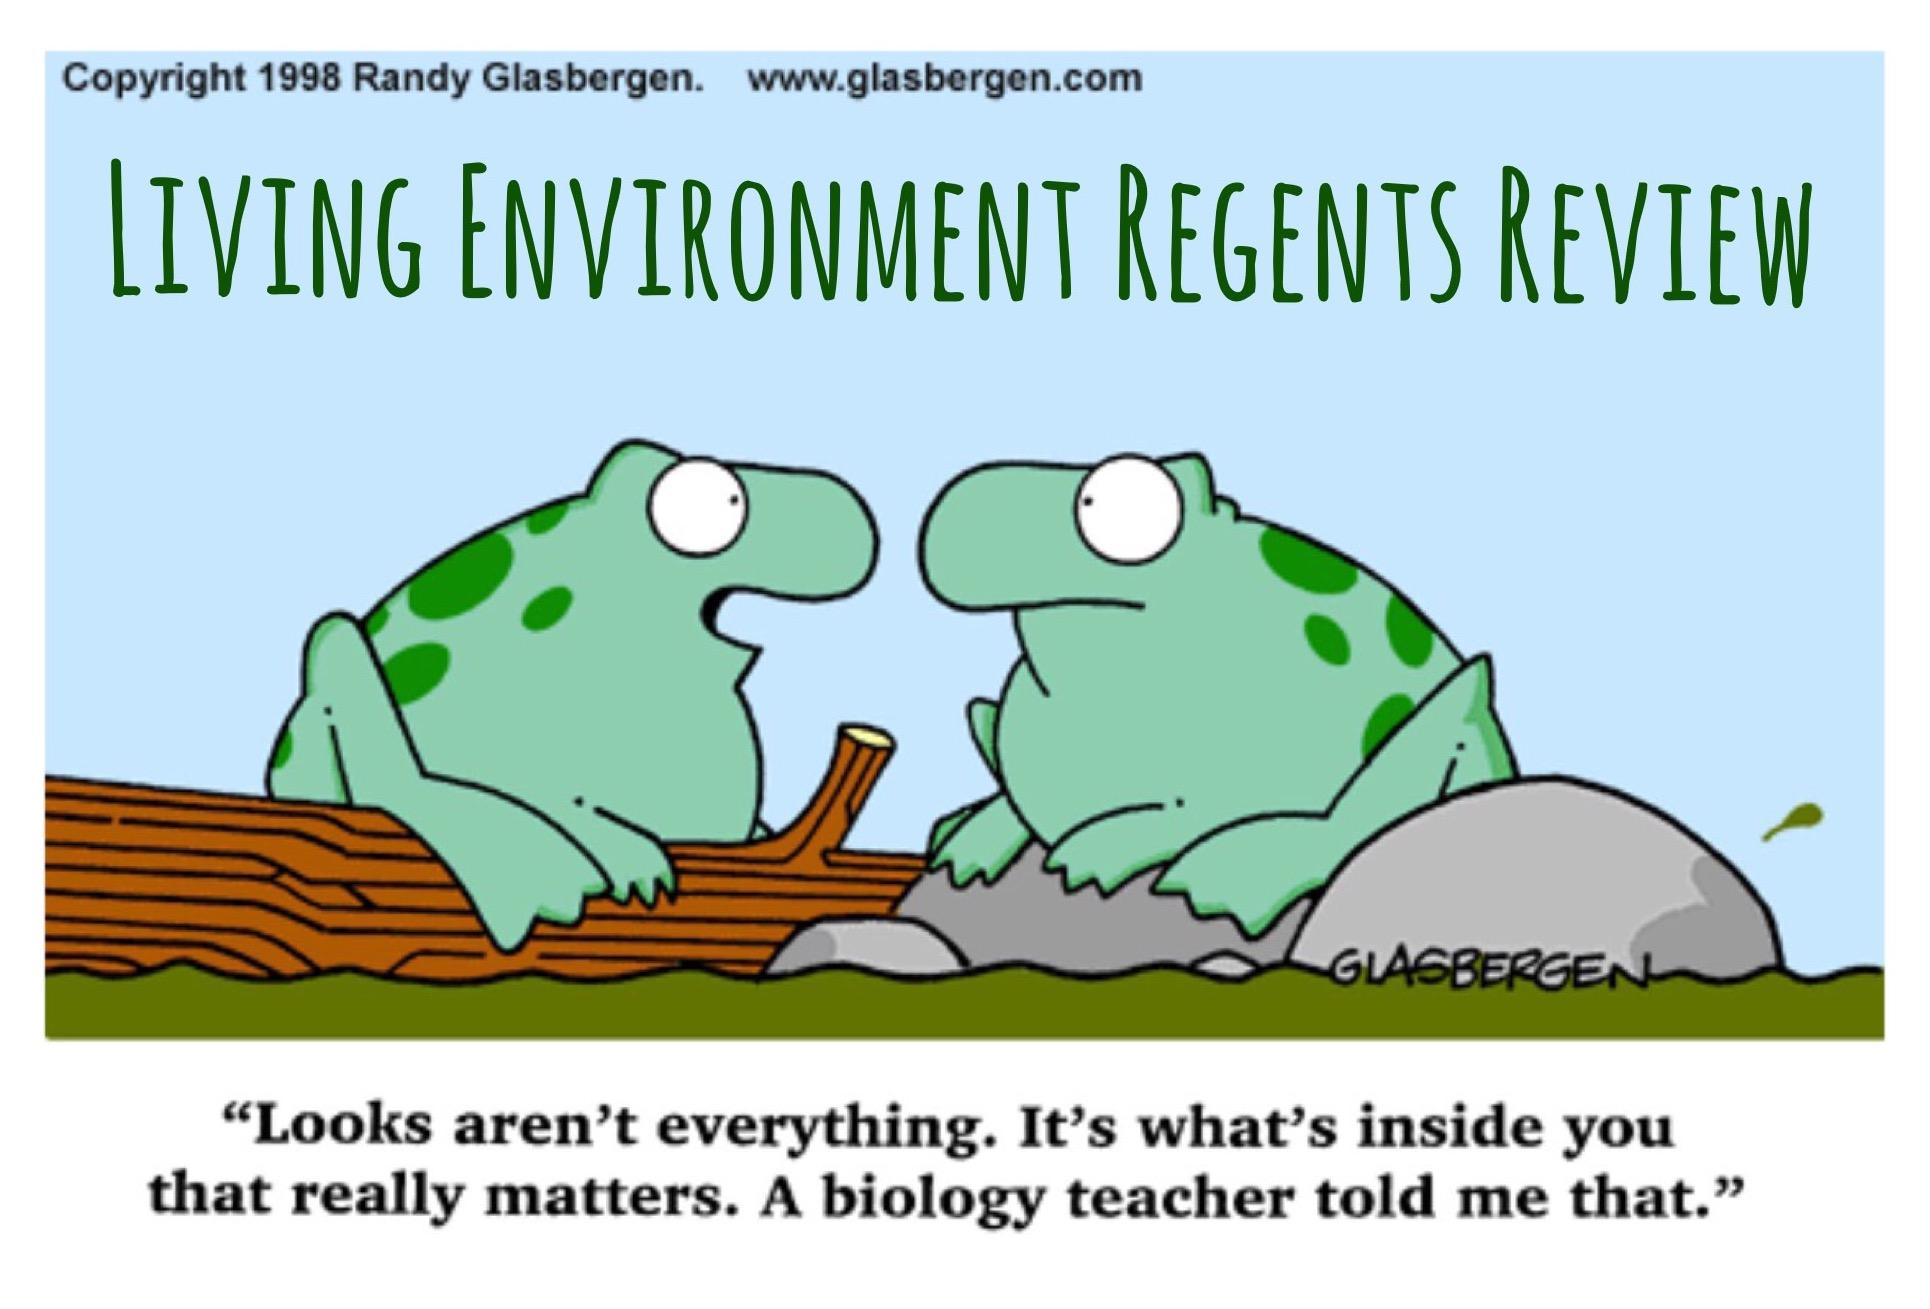 Living Environment Regents Review